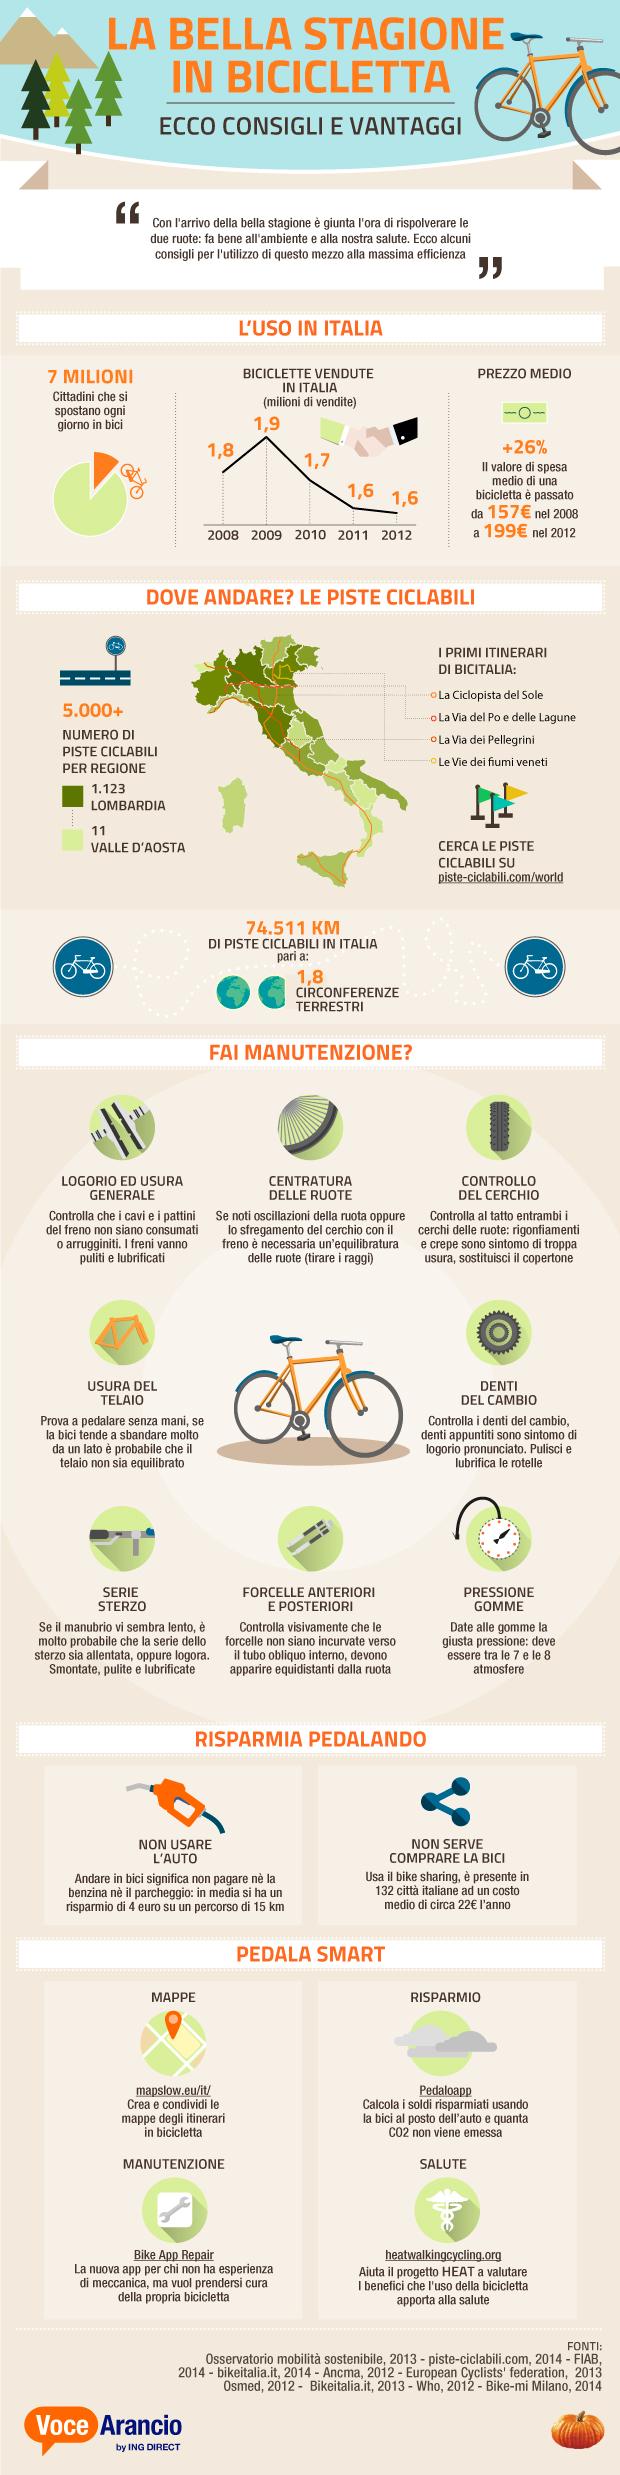 11ING_Bicicletta_0407 (2)